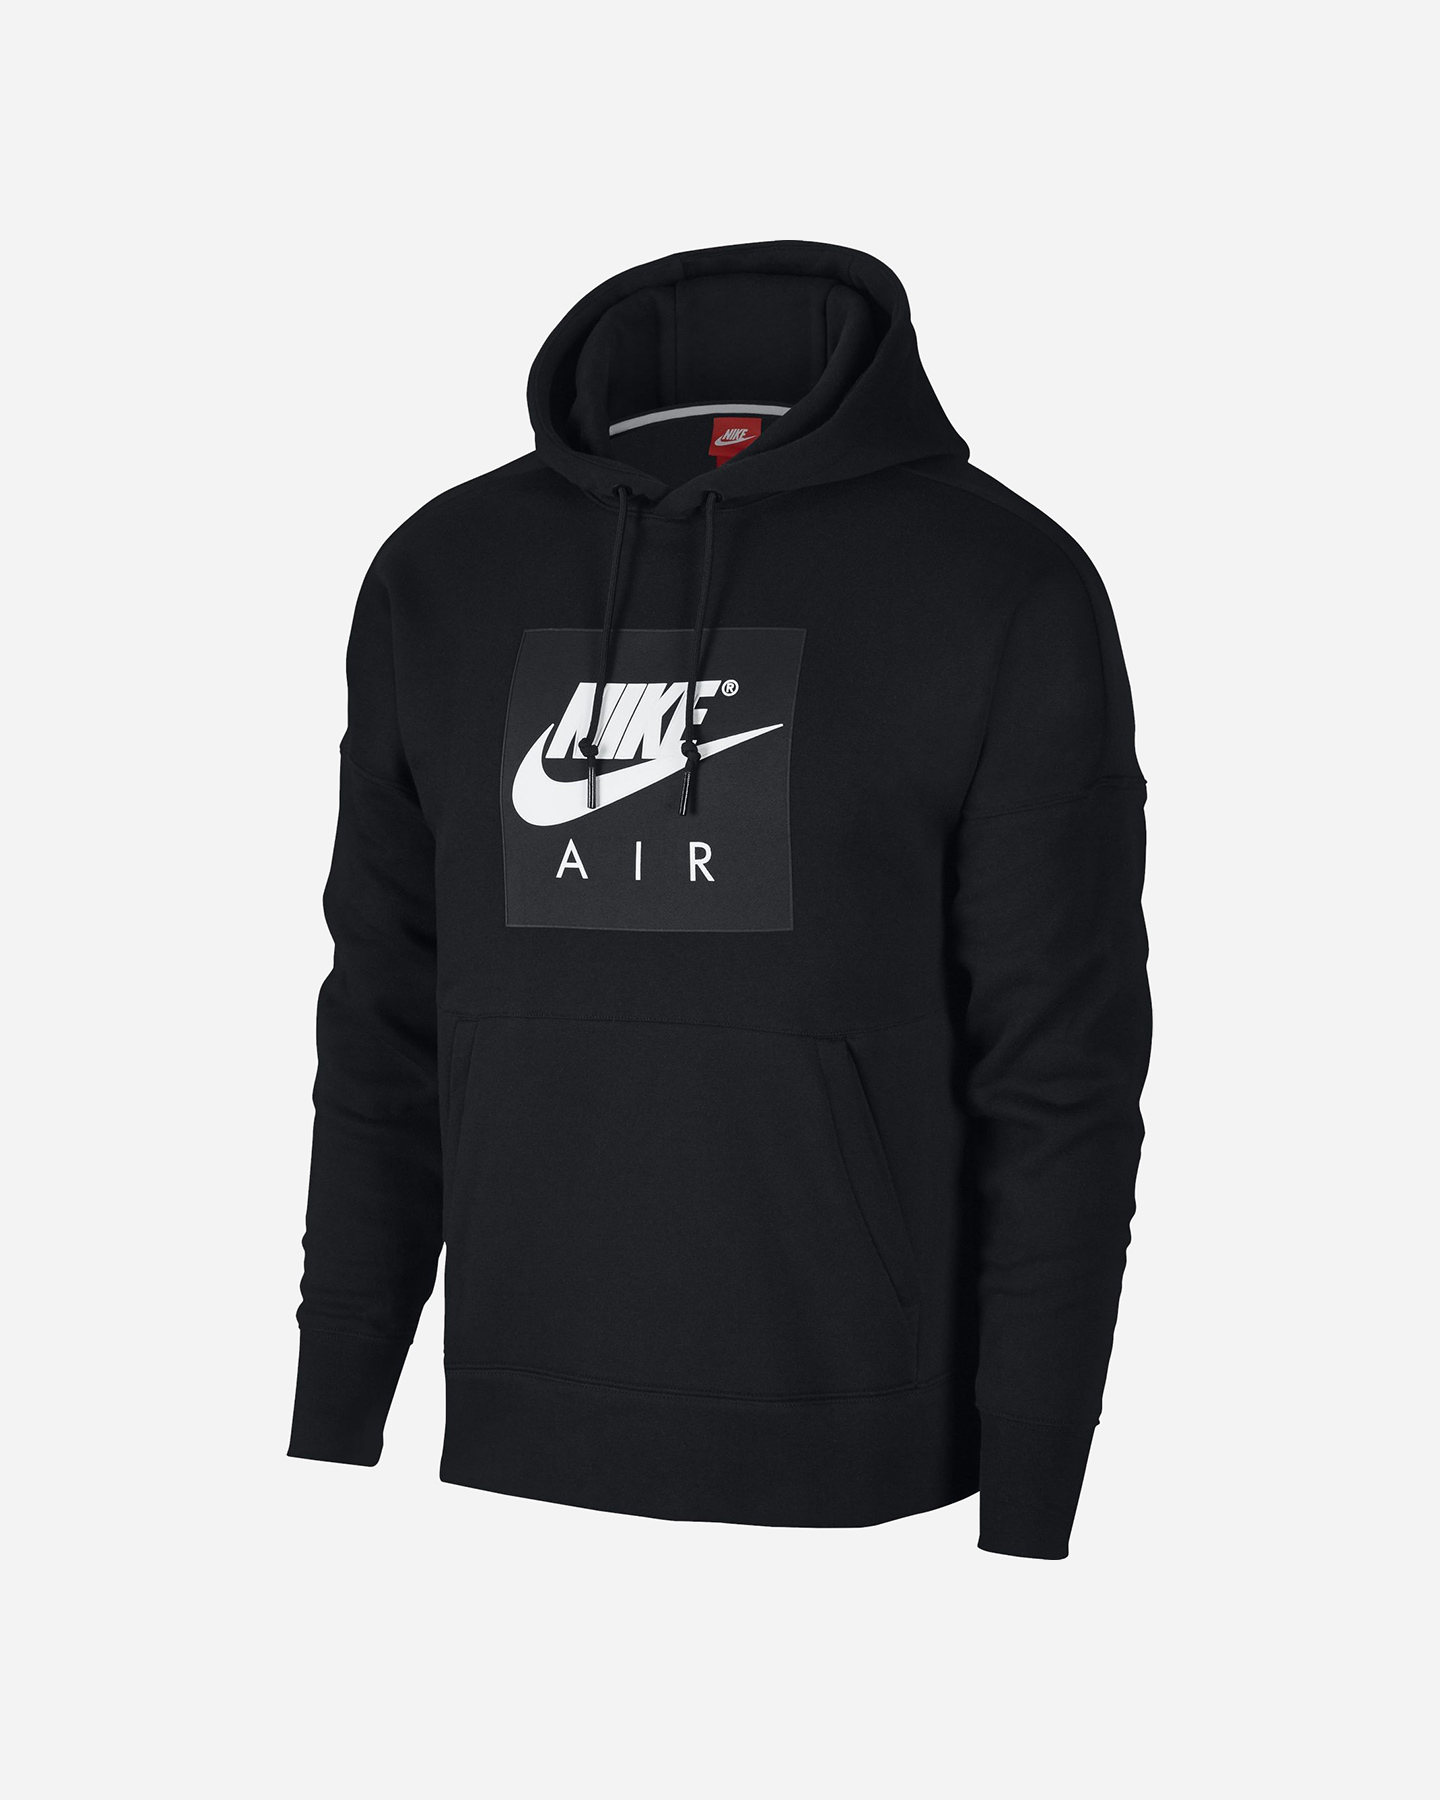 a425eb1dec732 Nike Nike Air Hoodie M 886046-010